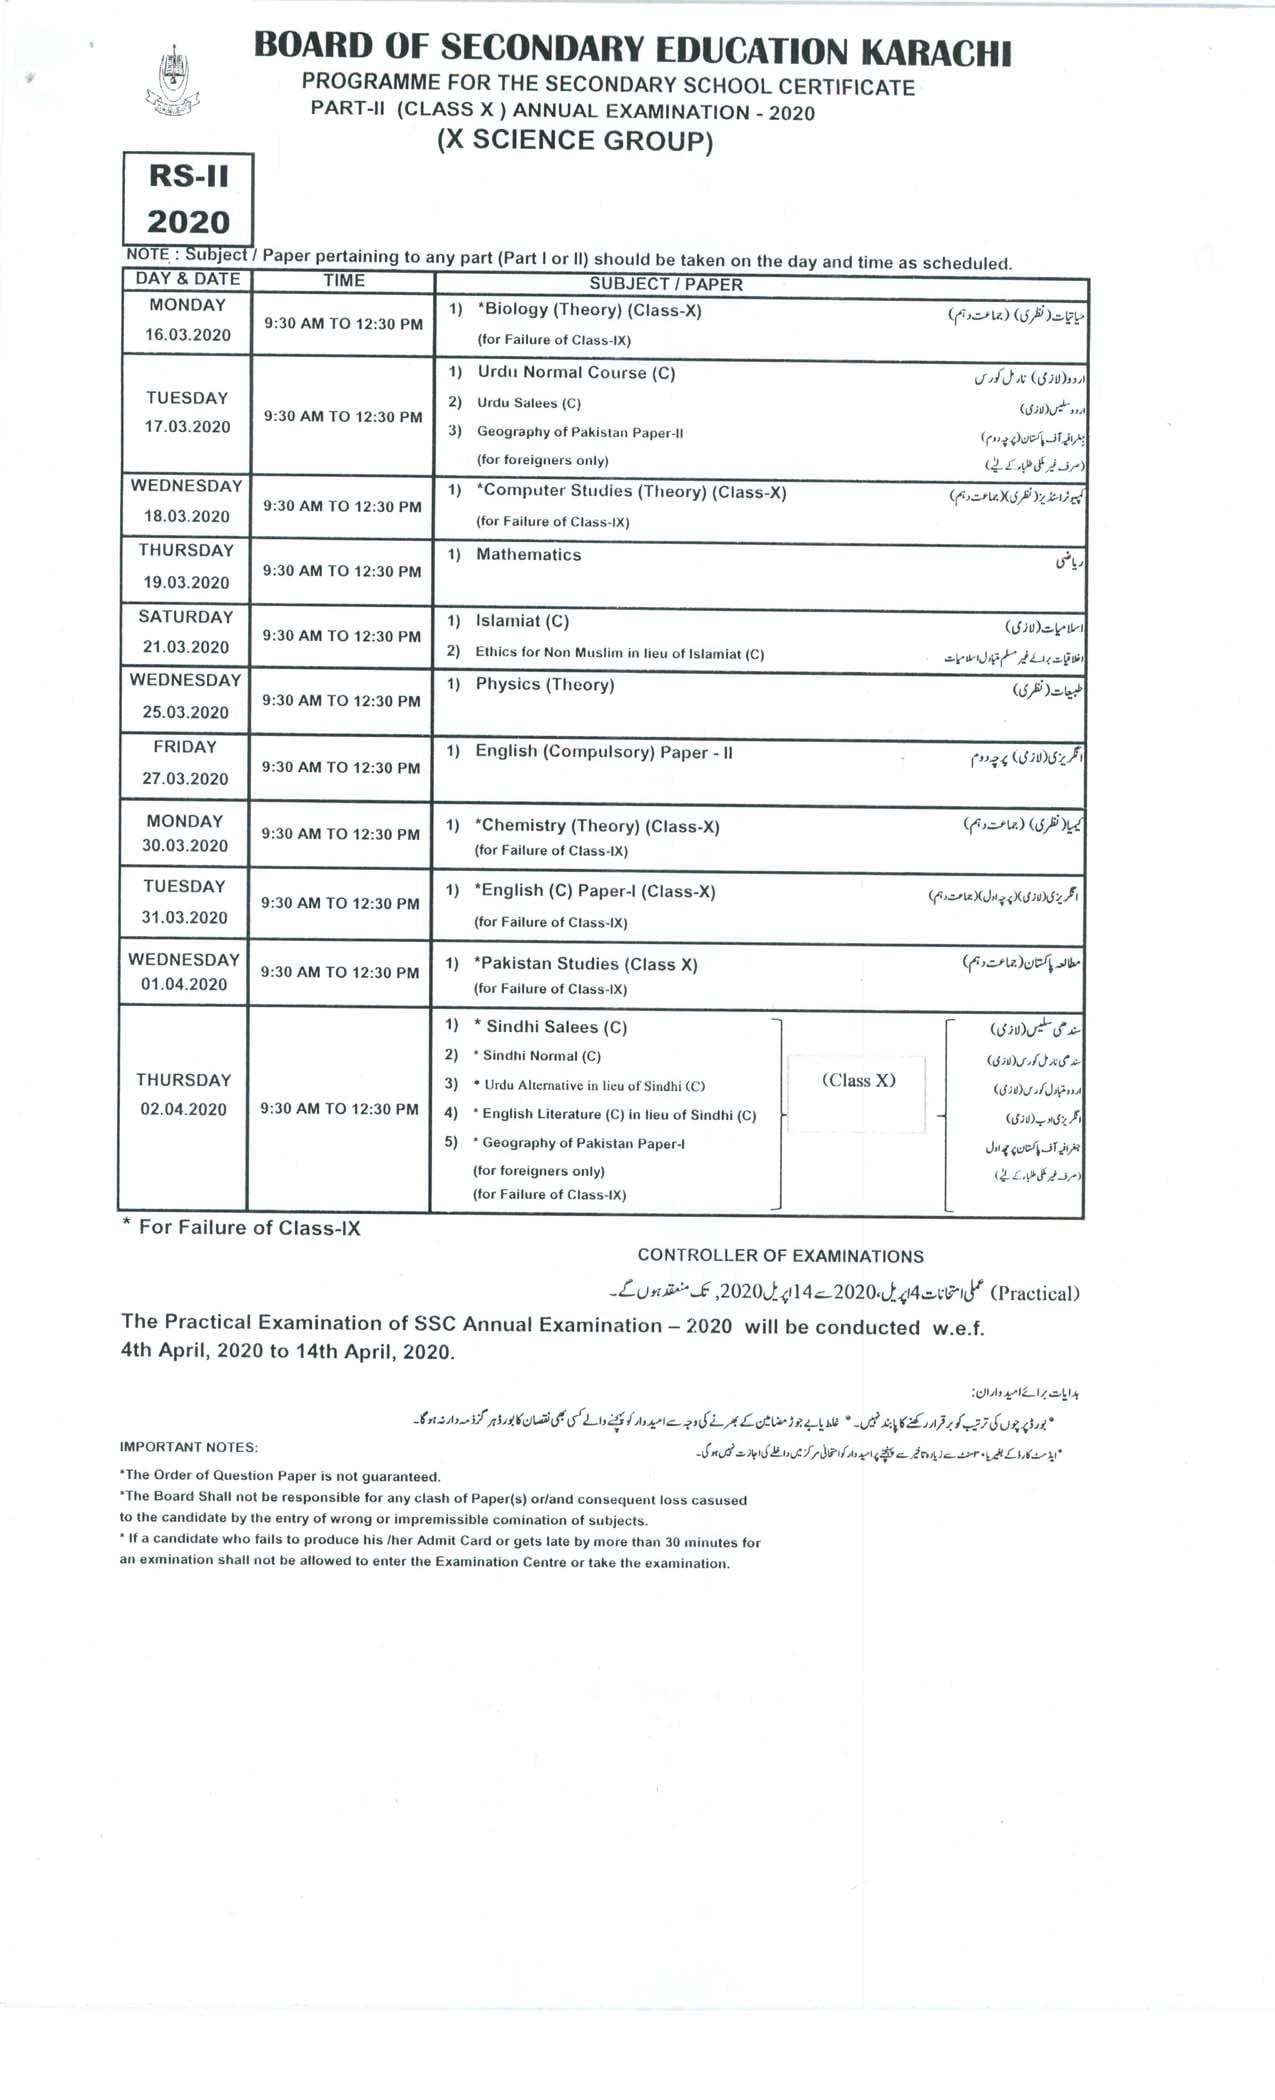 date sheet 10 class science group